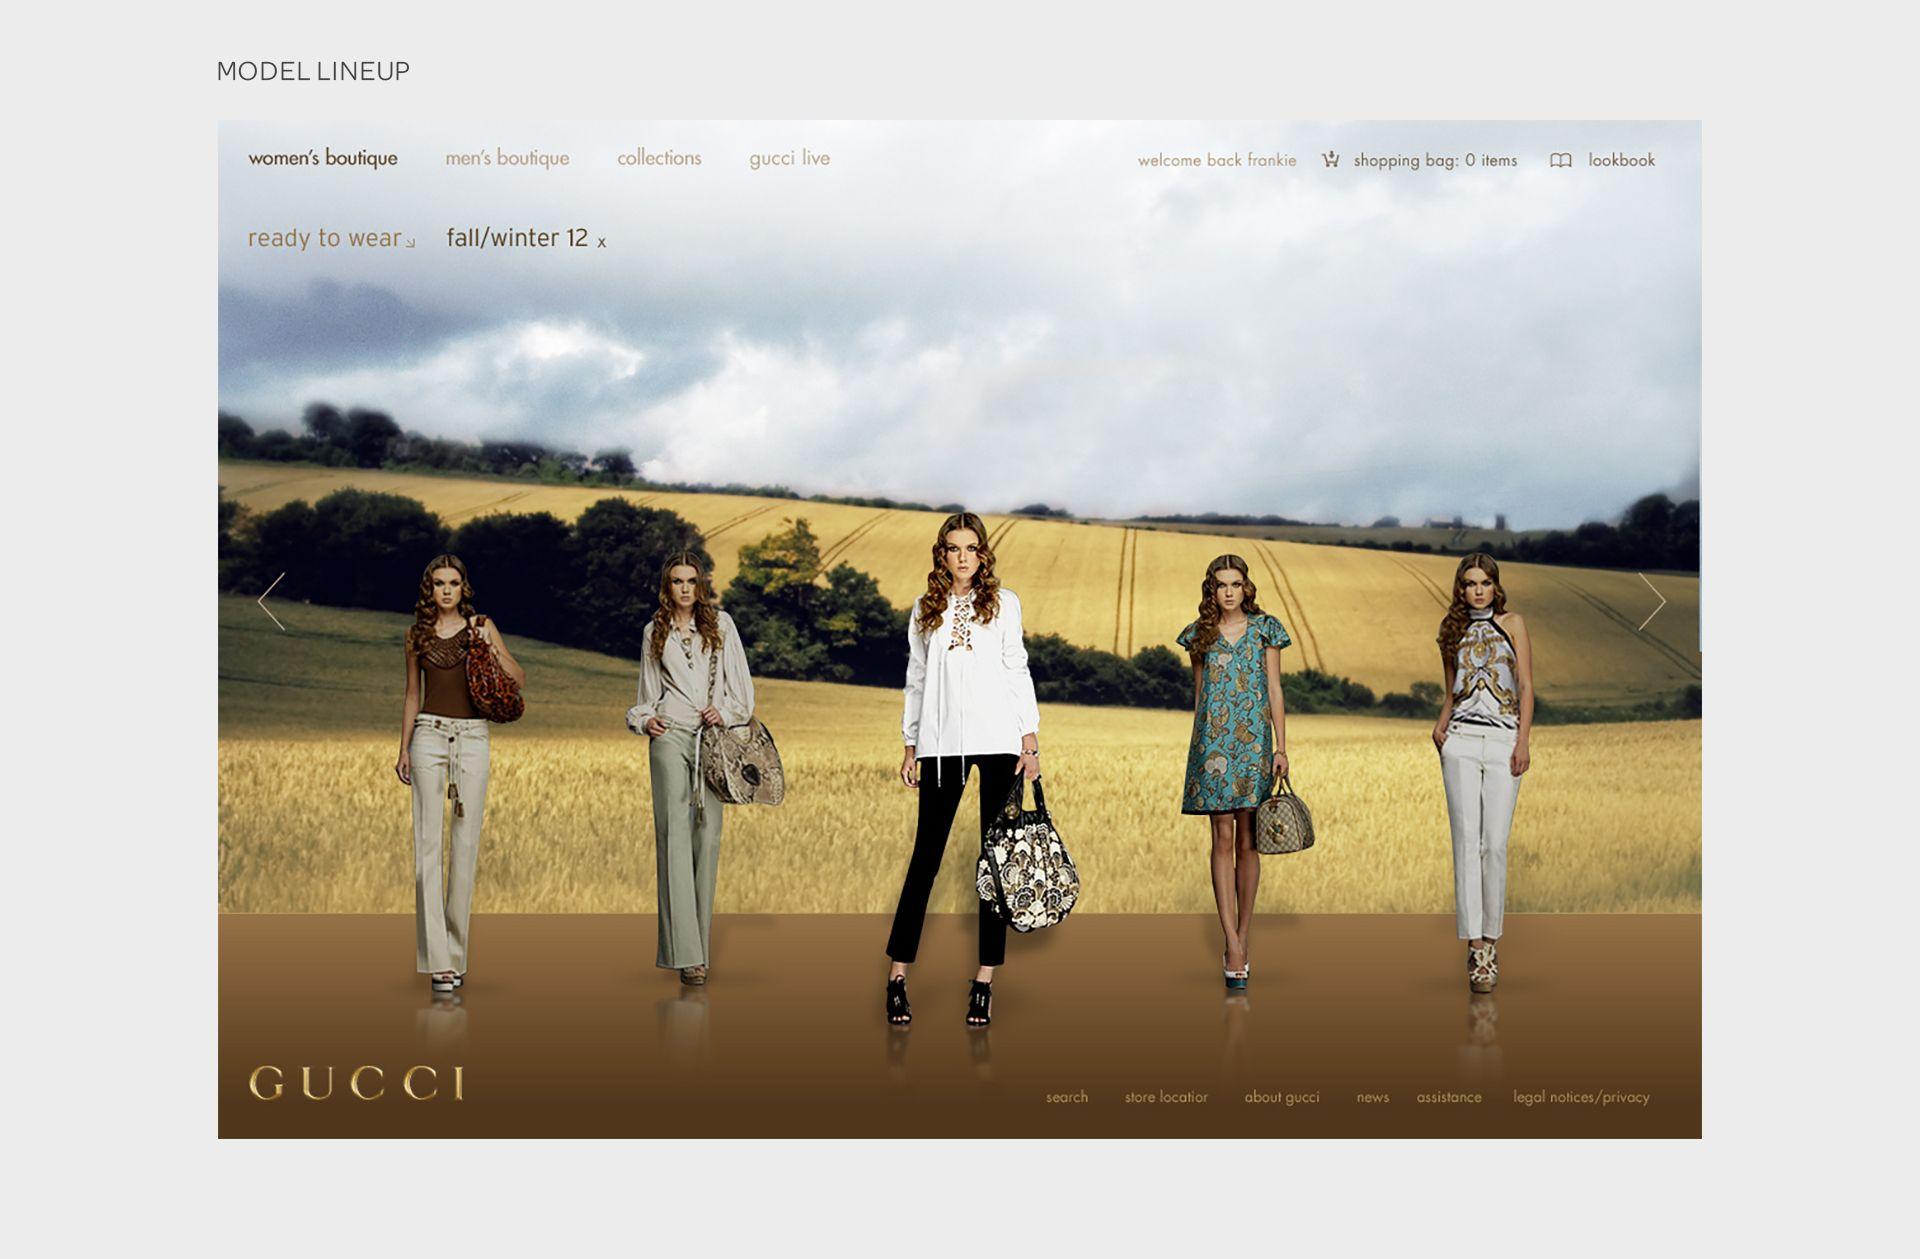 GUCCI-Model-Lineup-960x630@2x